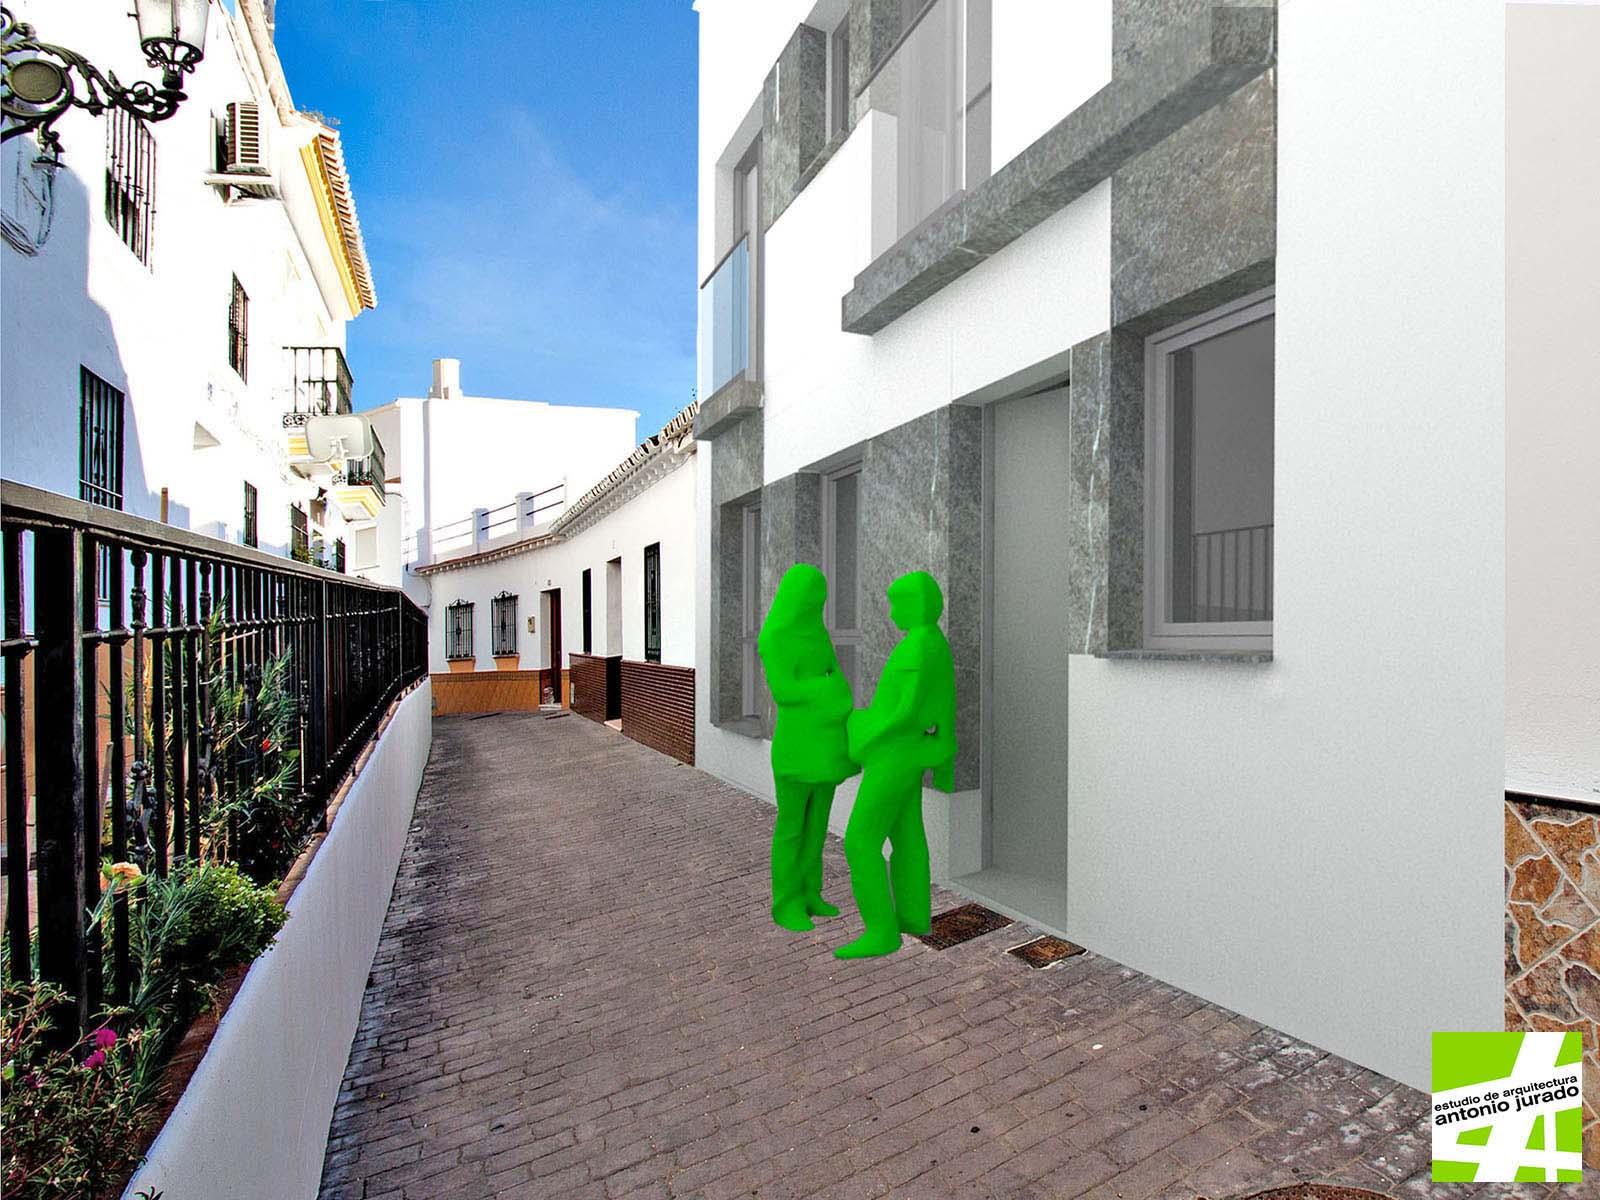 casa-ra-house-torrox-malaga-antonio-jurado-arquitecto-03